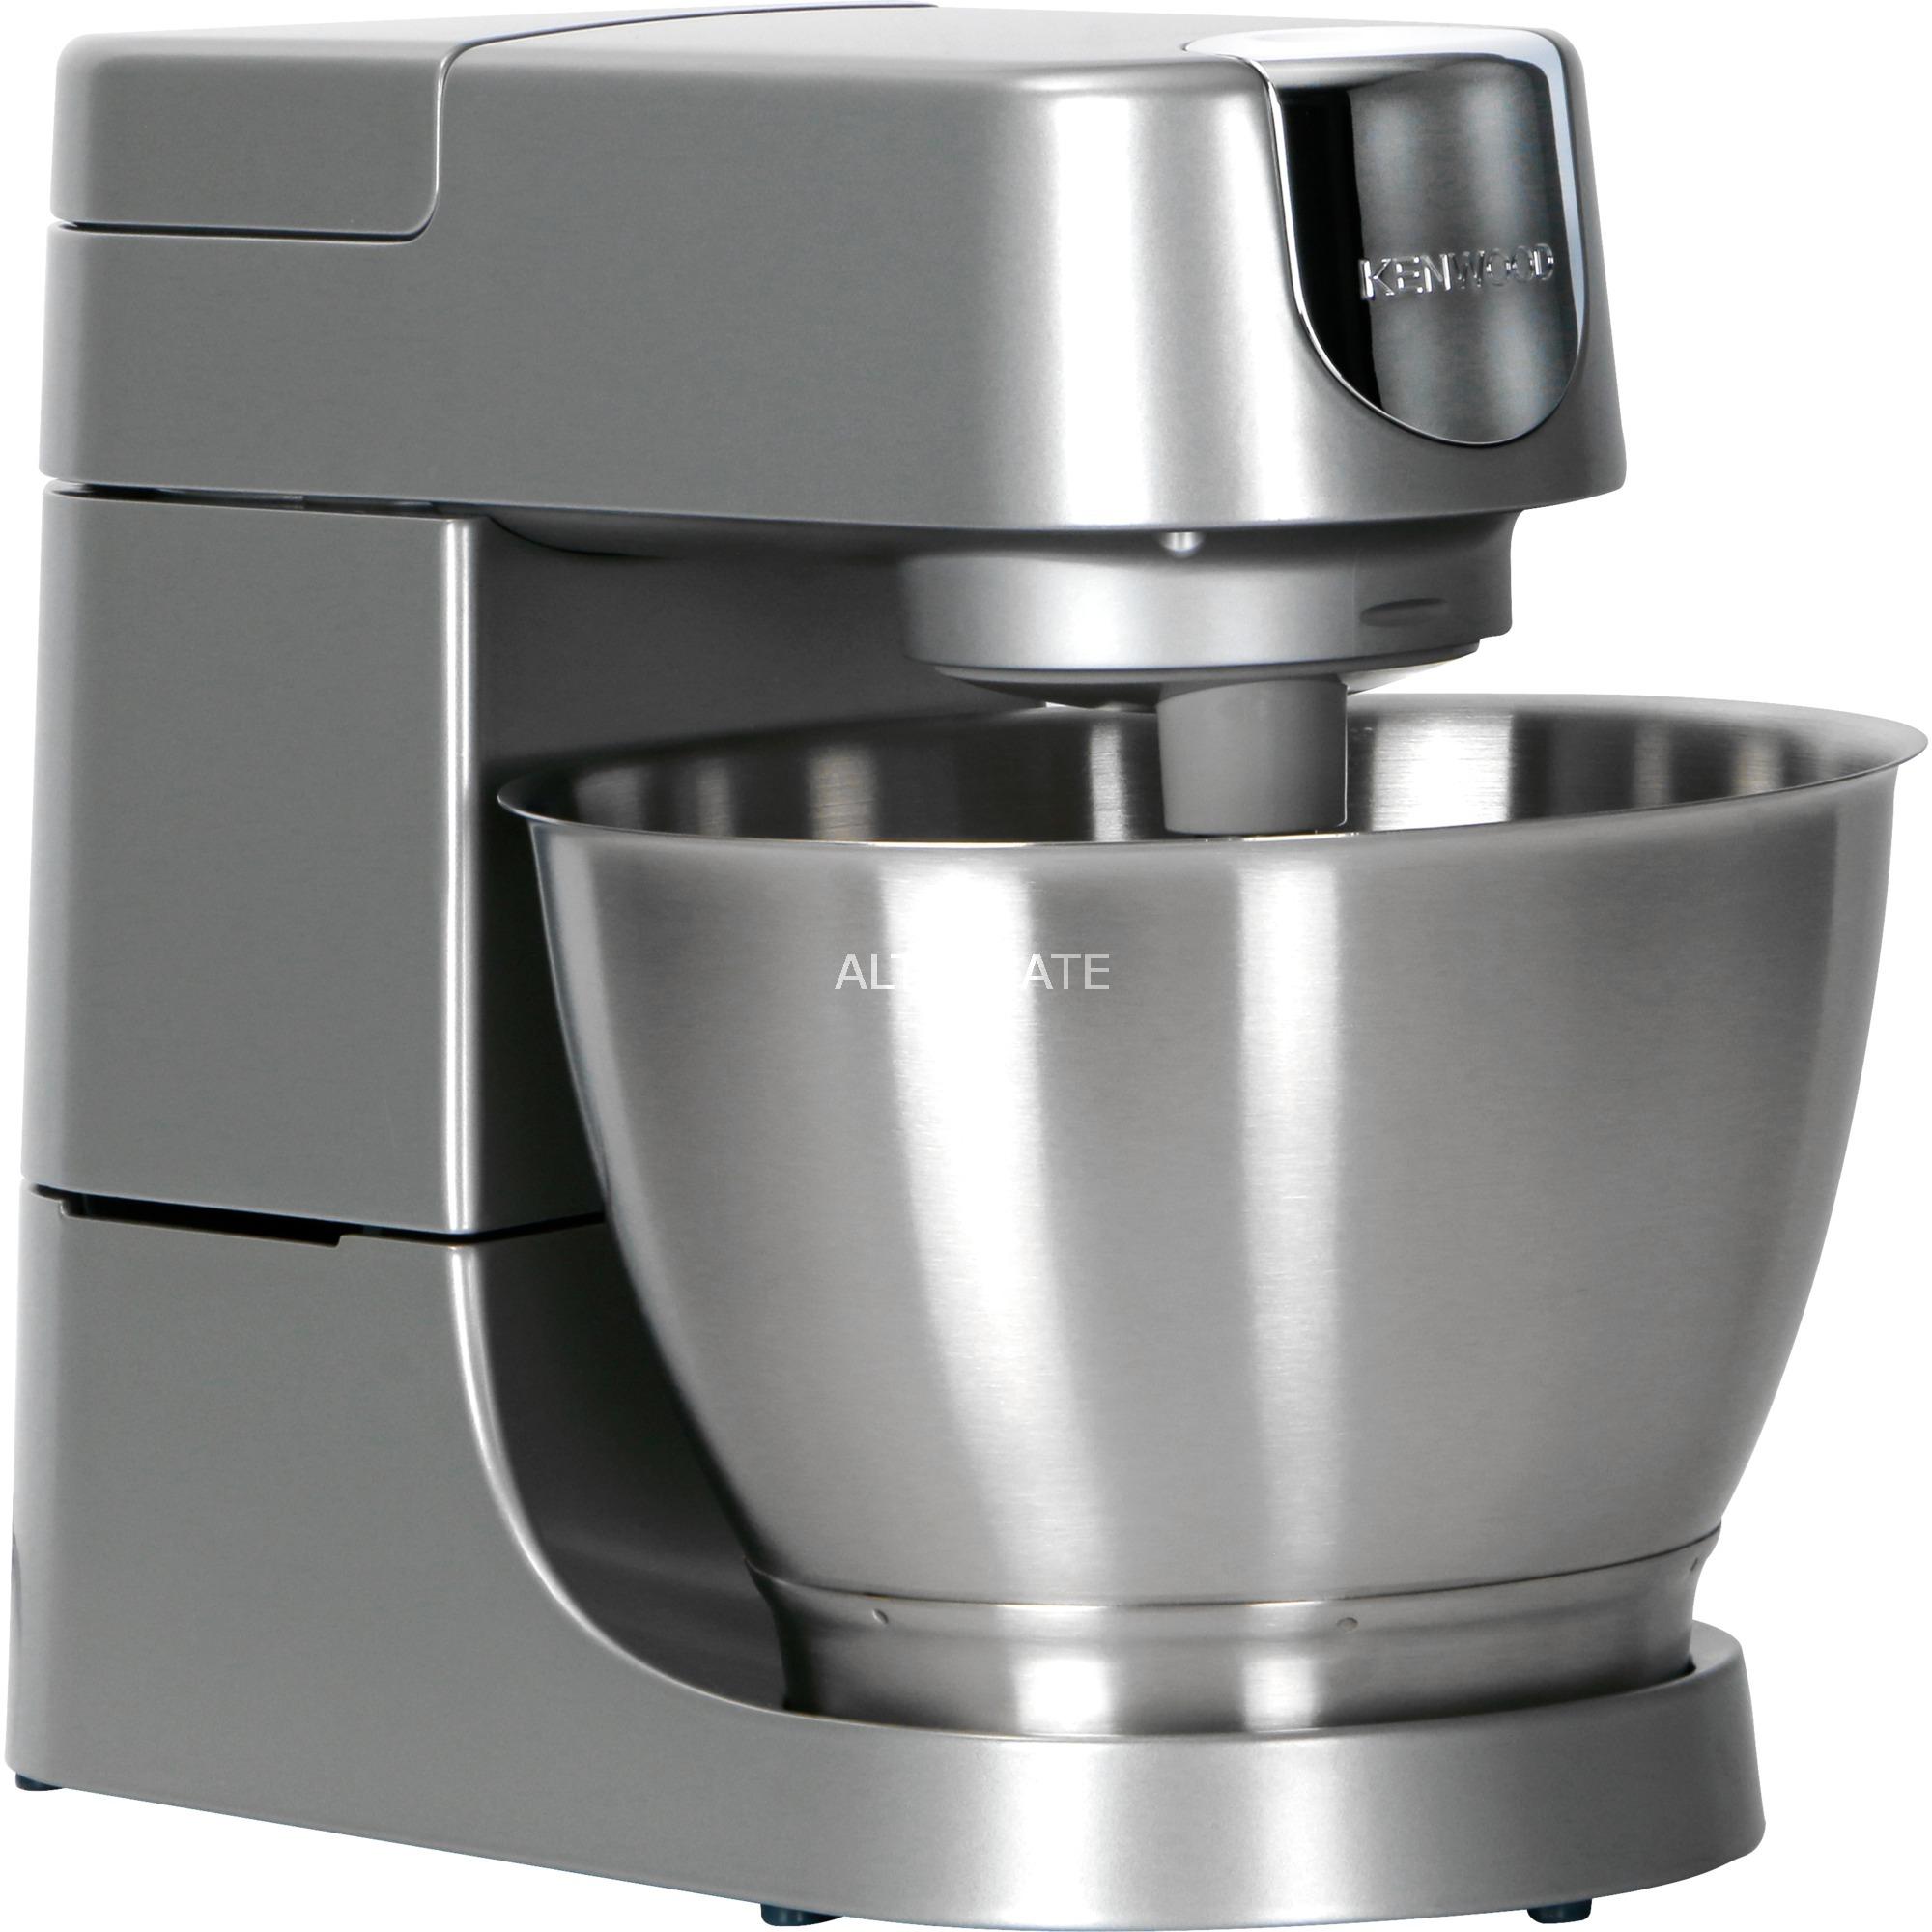 KVC3110S 1000W 4.6L Plata robot de cocina